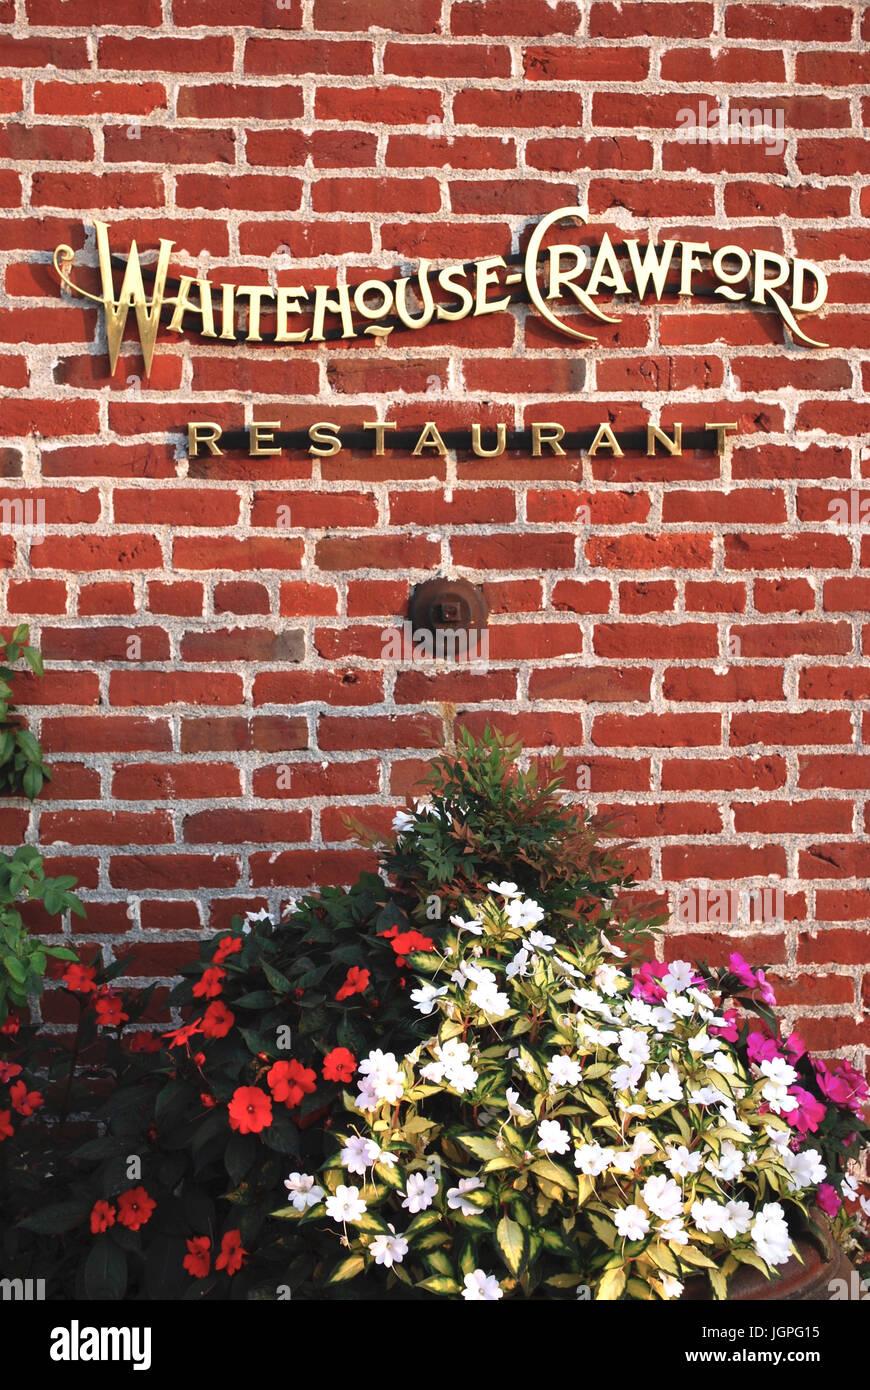 Whitehouse Crawford Restaurant Walla Walla Wa Usa Stock Photo